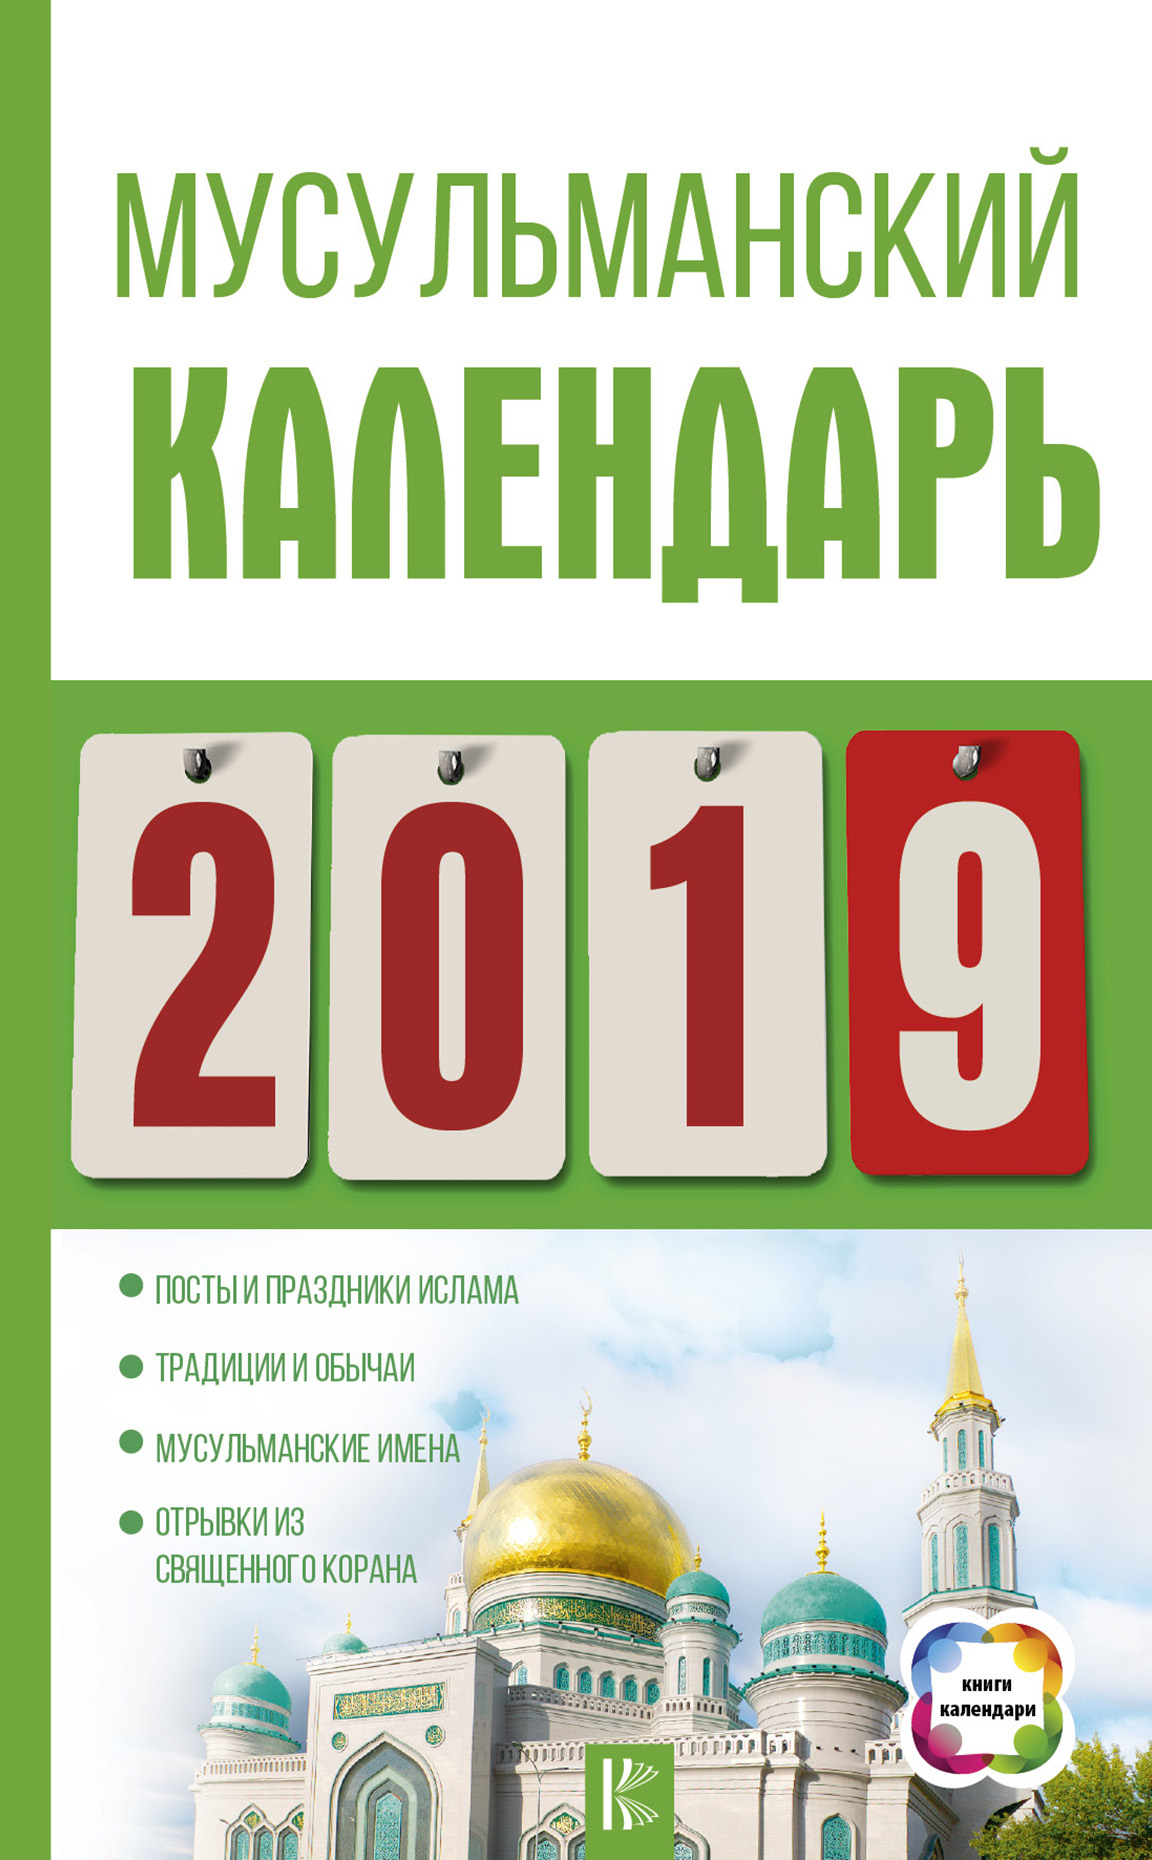 Диана Хорсанд-Мавроматис Мусульманский календарь на 2019 год цена и фото